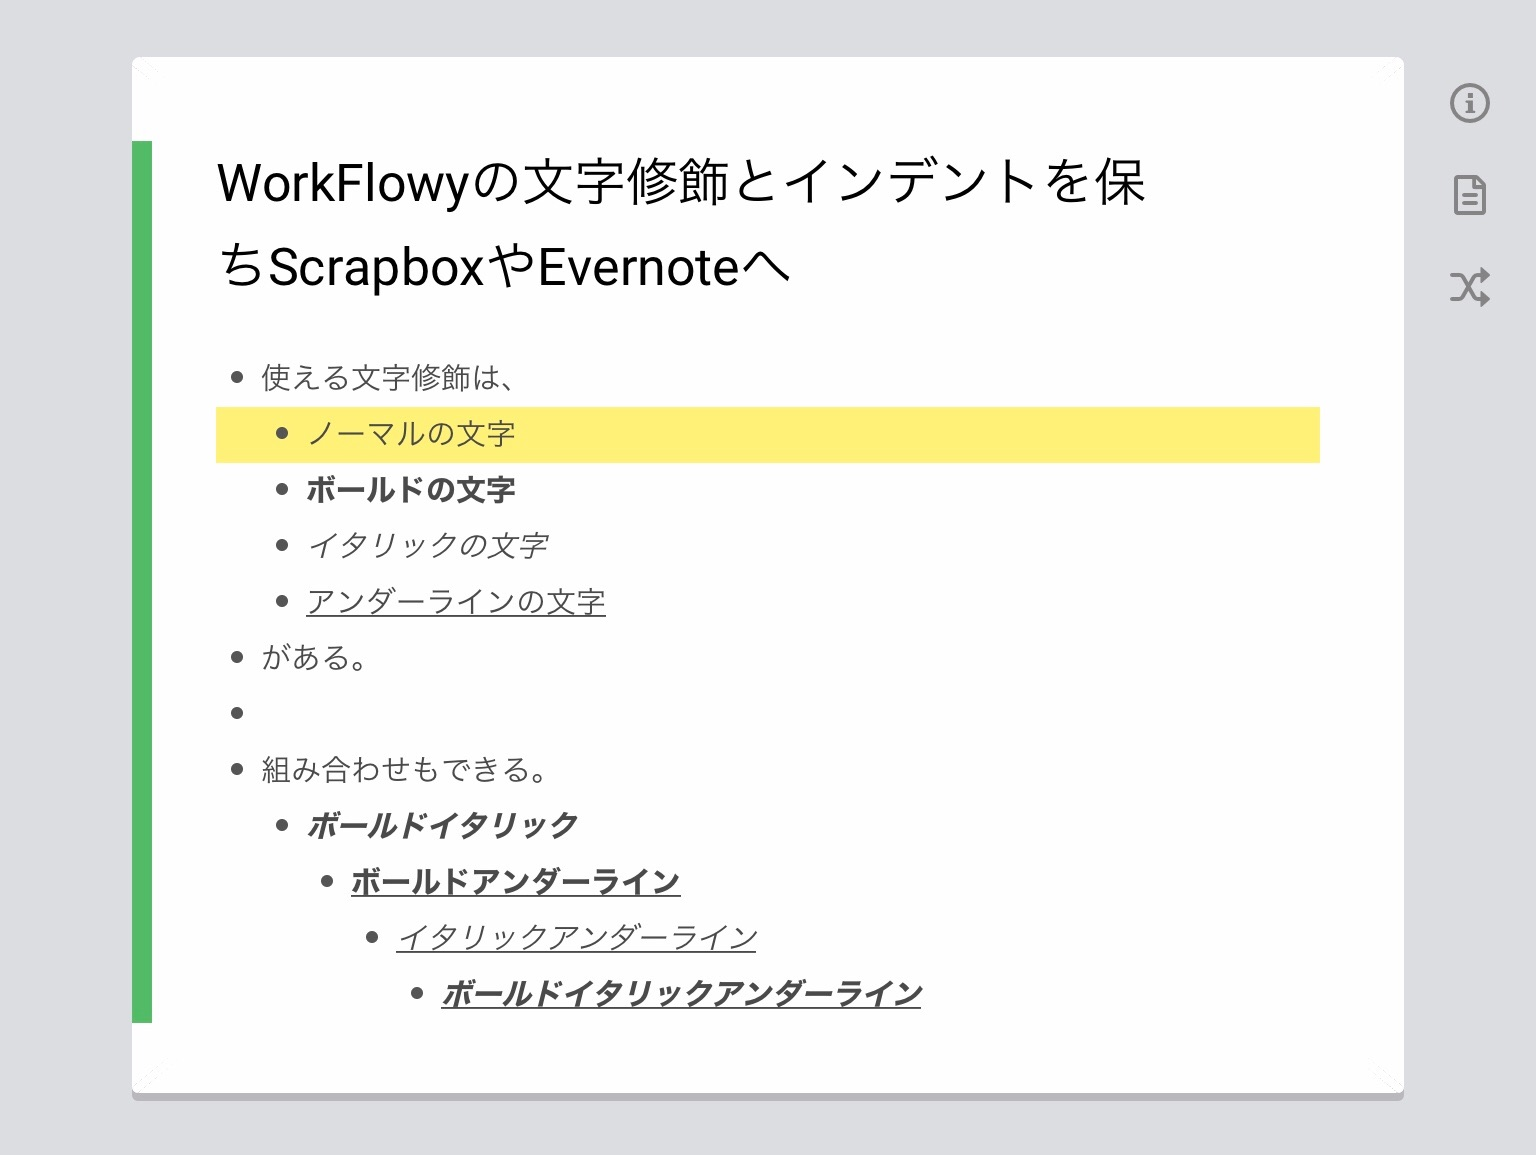 f:id:sorashima:20200731233602j:plain:w637